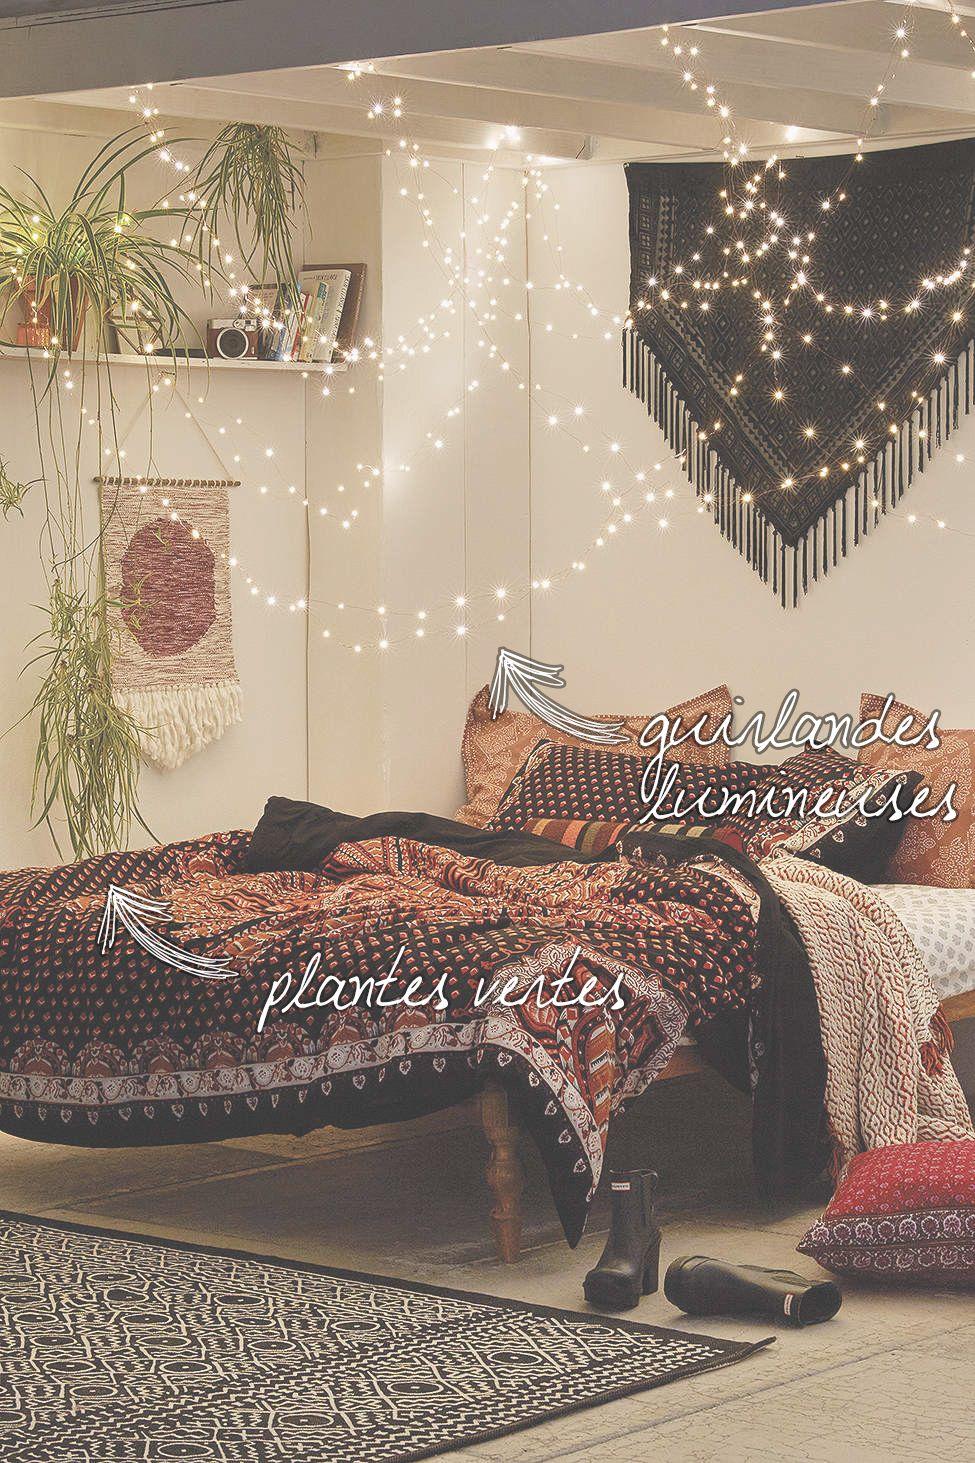 chambre boheme home pinterest boh me chambres et. Black Bedroom Furniture Sets. Home Design Ideas